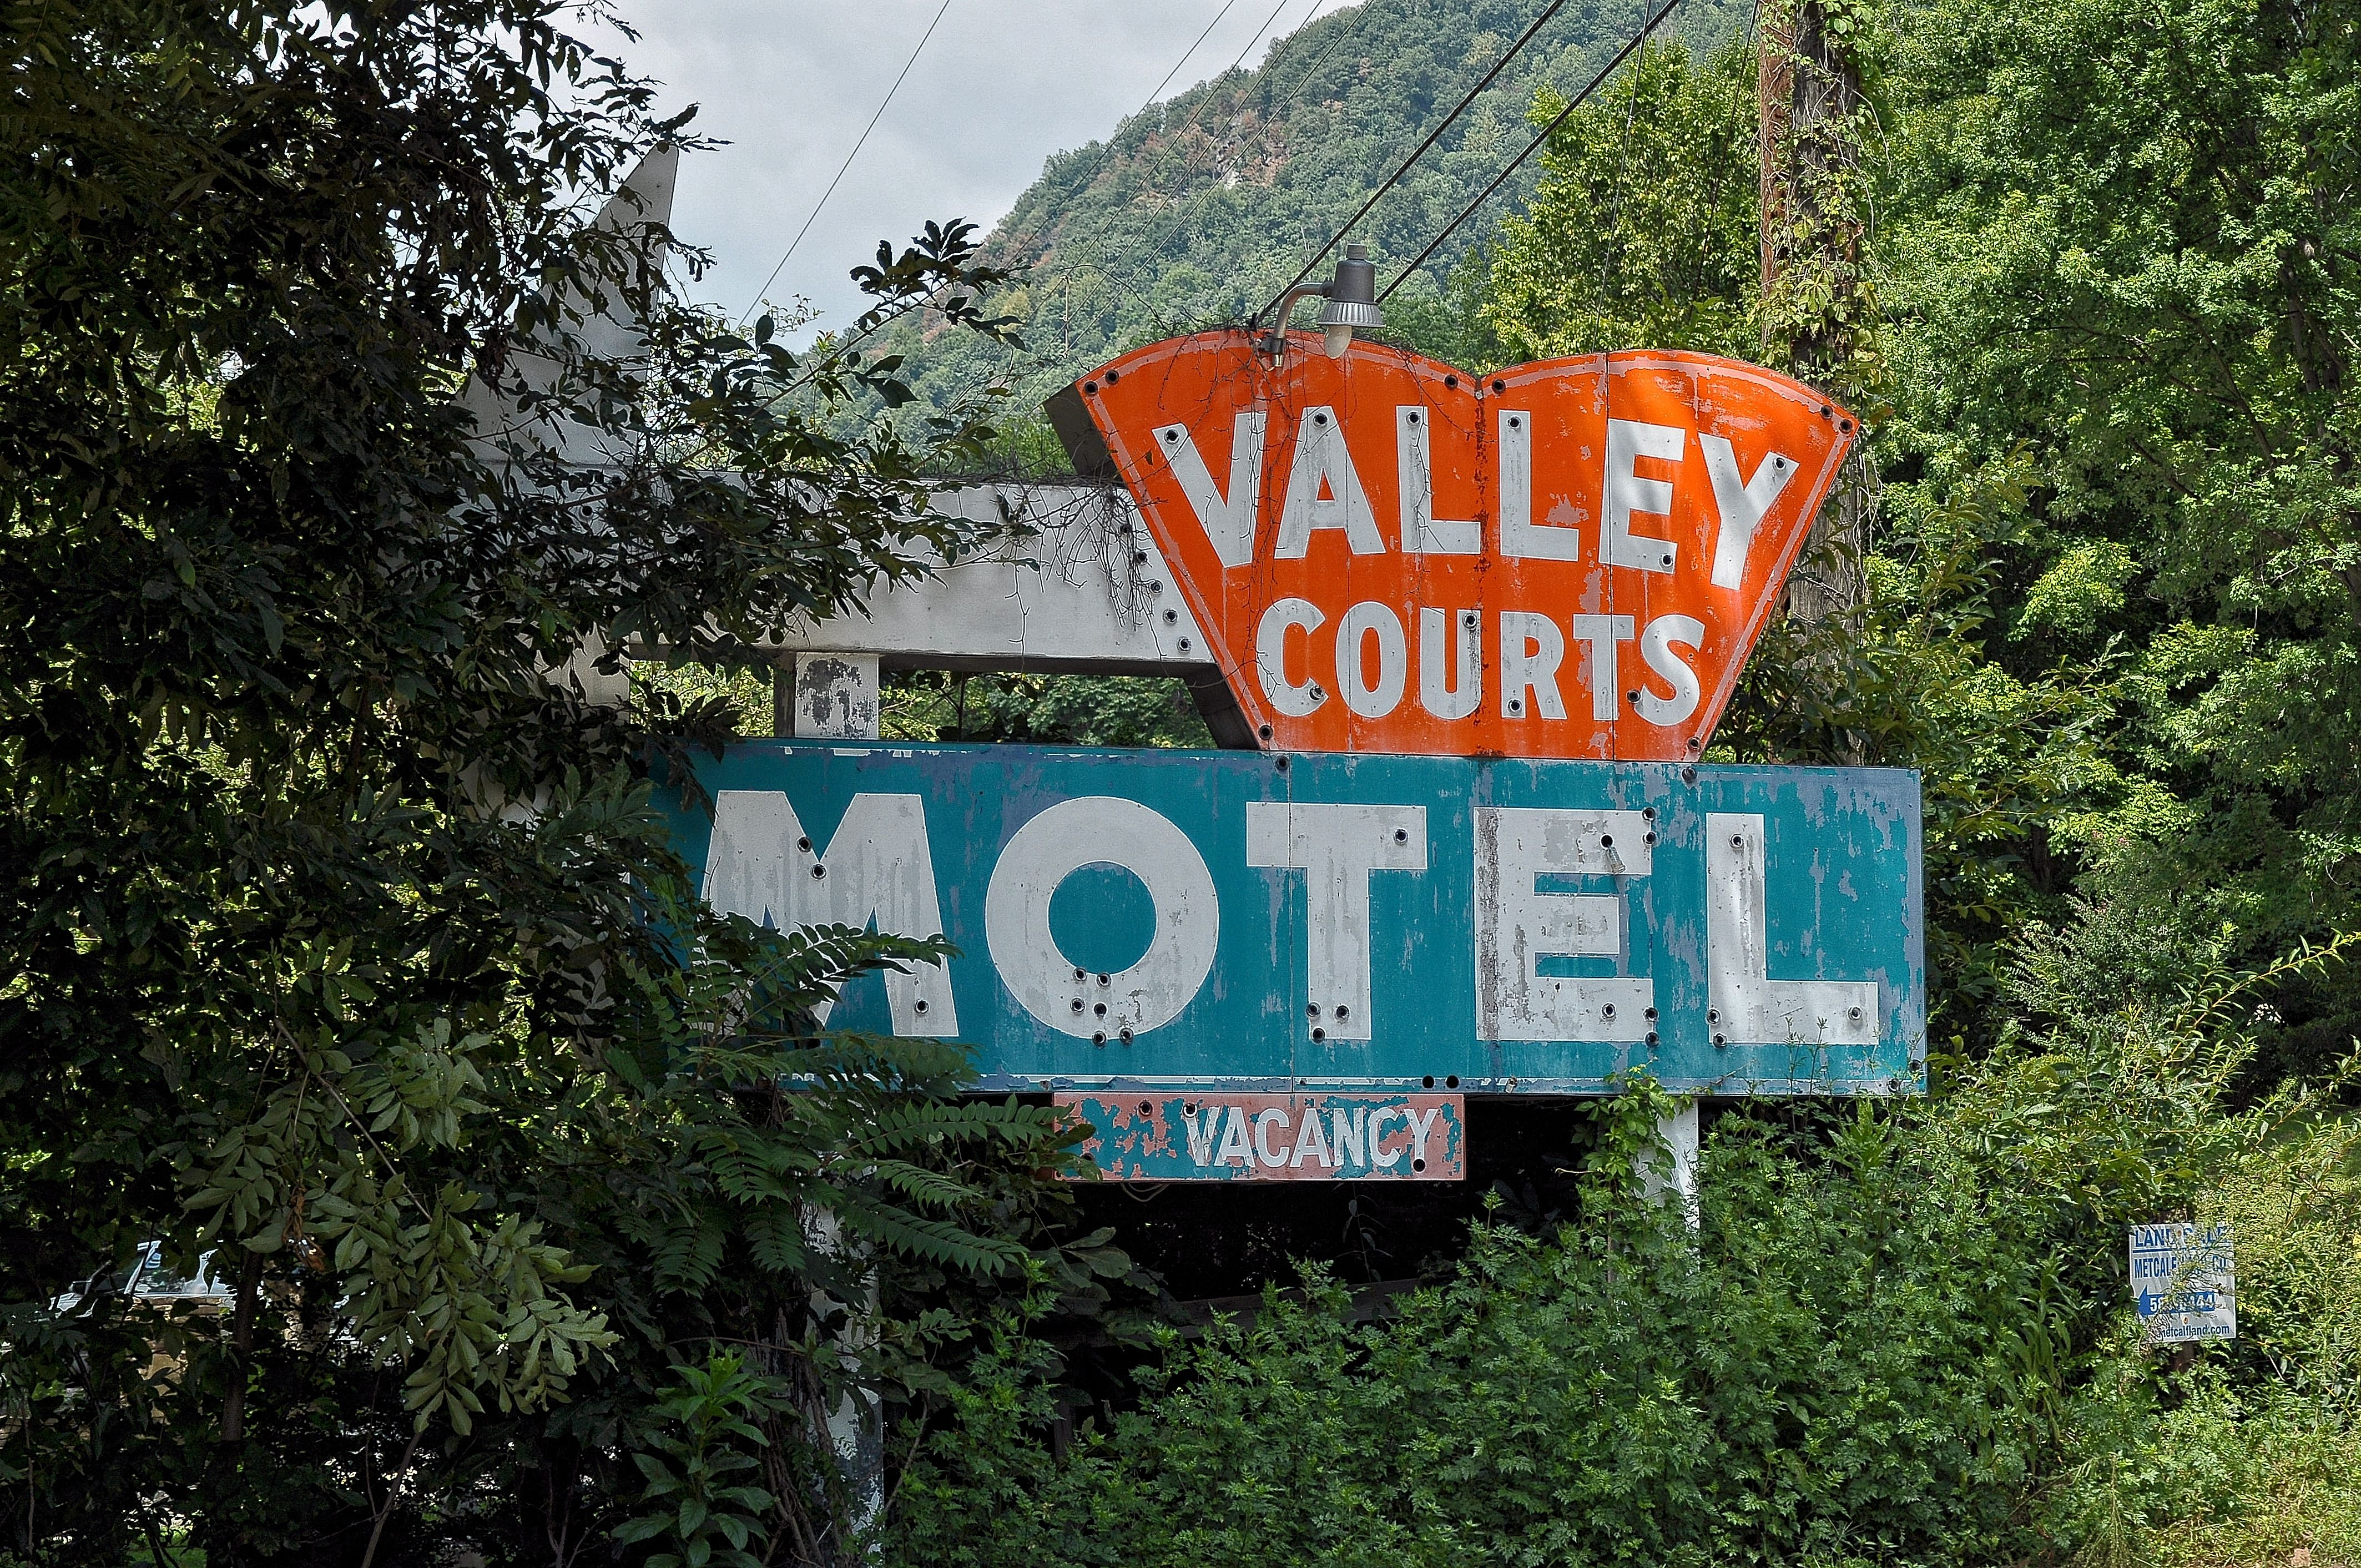 Valley Courts Motel - Saluda, North Carolina U.S.A. - August 15, 2011